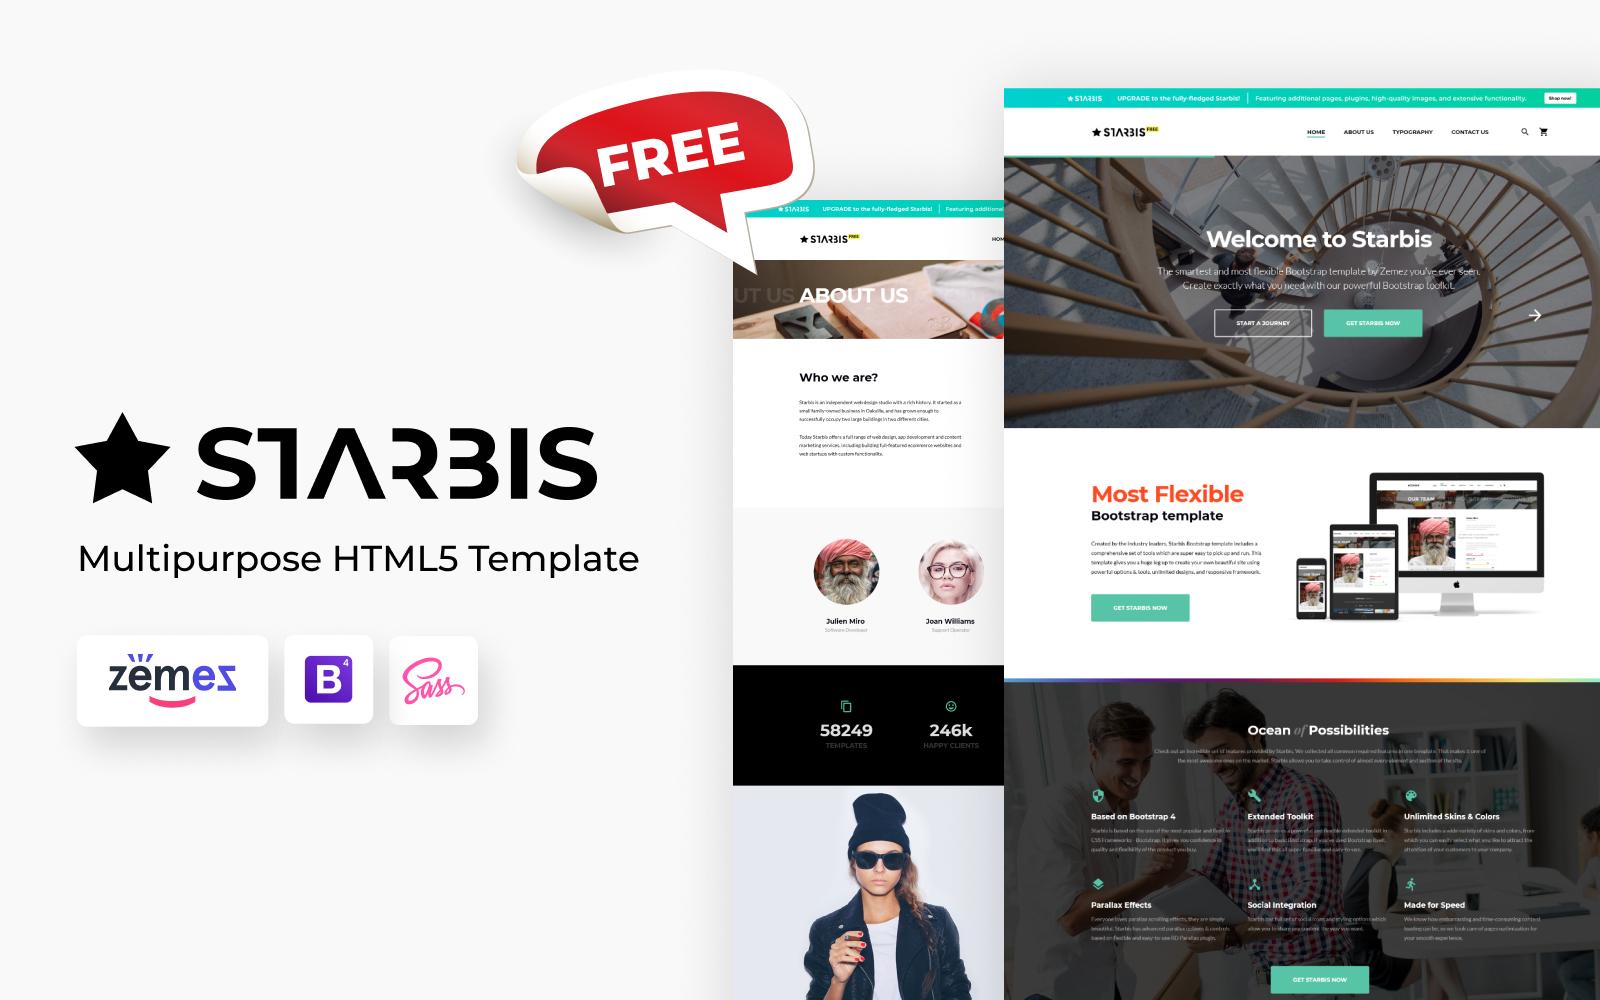 Reszponzív Free Starbis Multipurpose HTML Weboldal sablon 124757